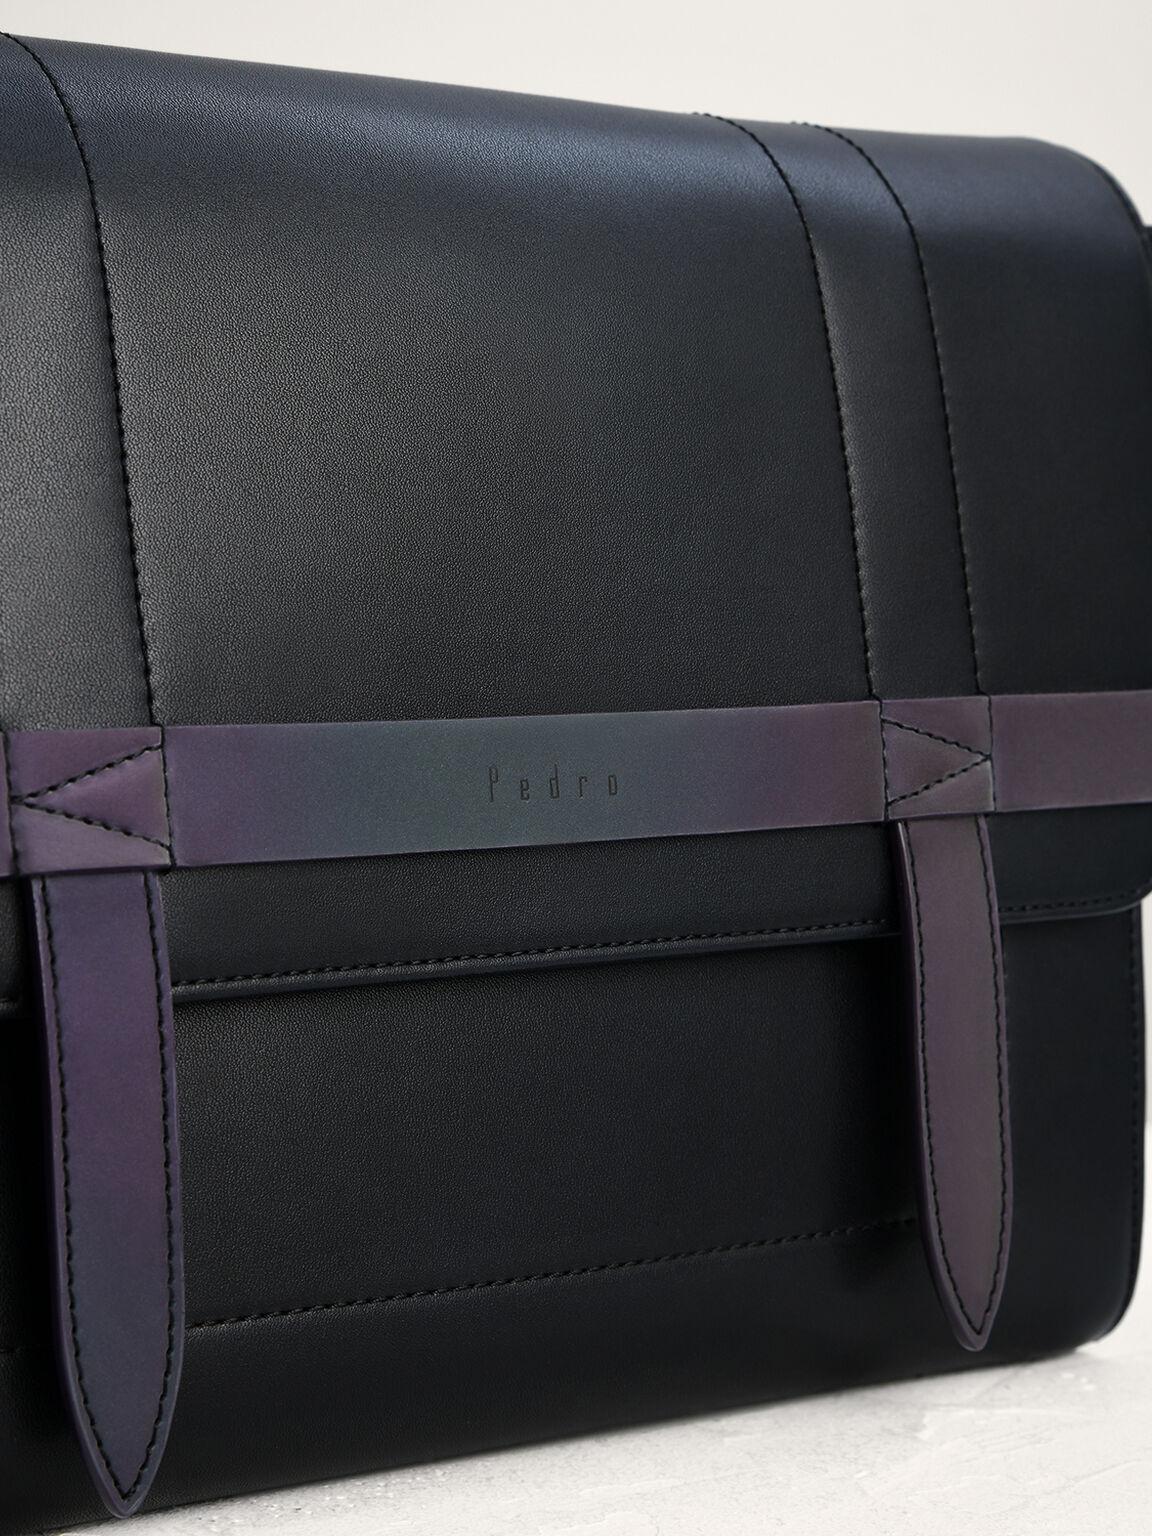 Two-Way Messenger Bag, Black, hi-res